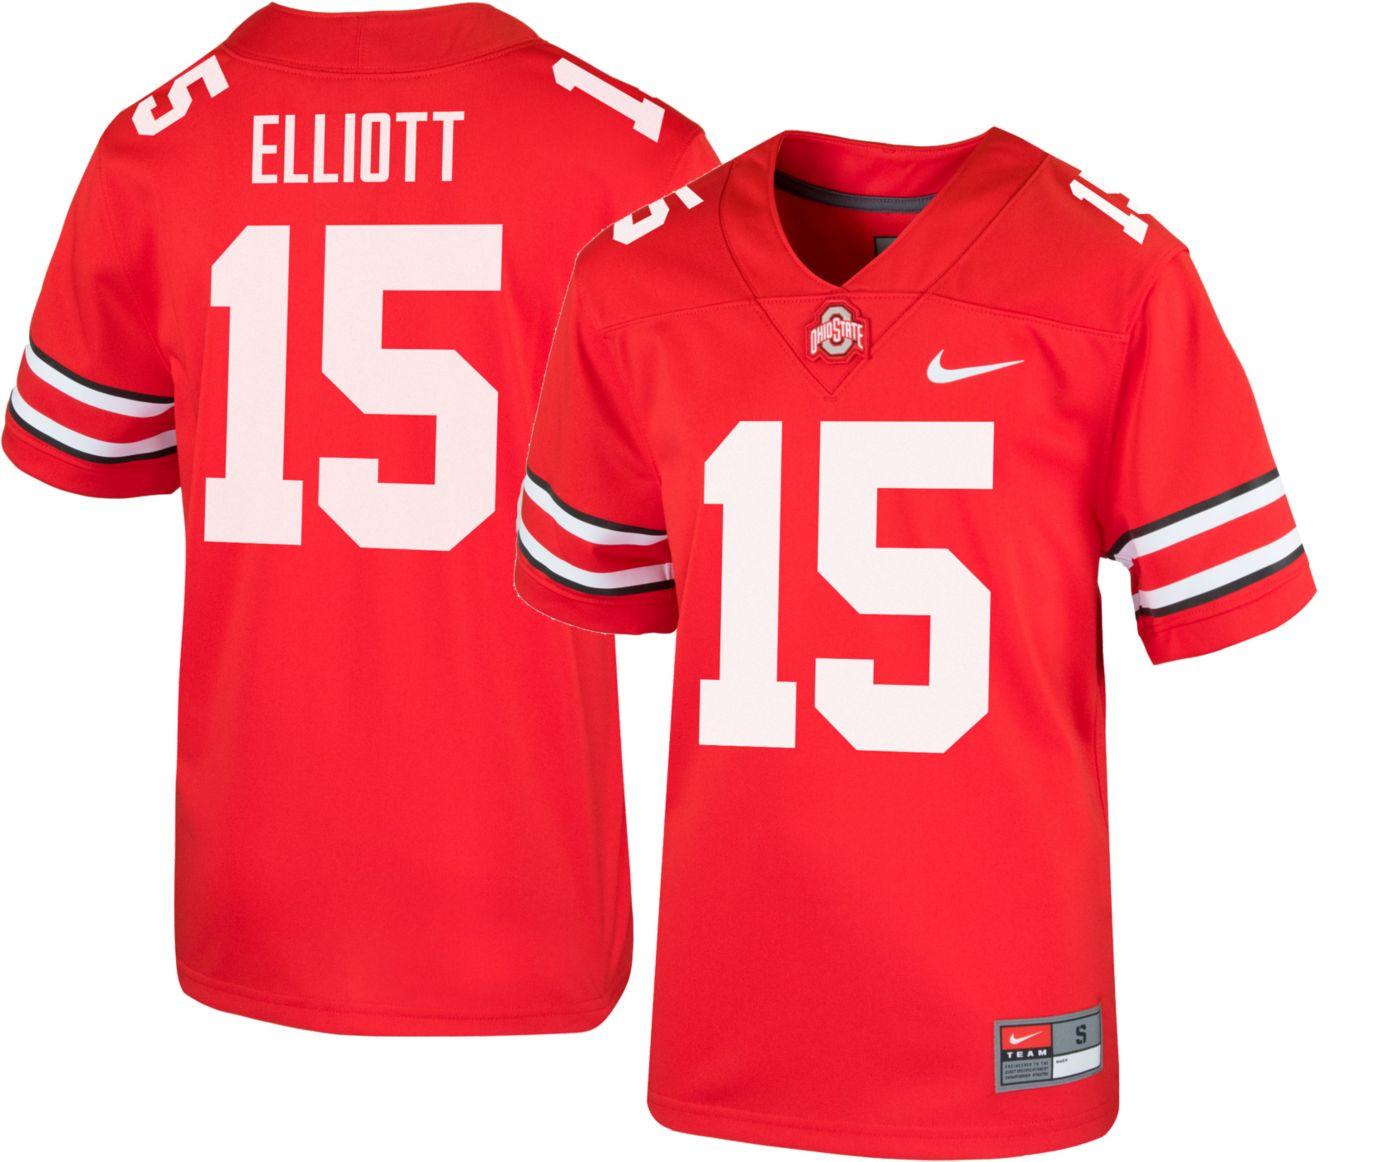 Nike Youth Ezekiel Elliott Ohio State Buckeyes #15 Scarlet Replica Football Jersey